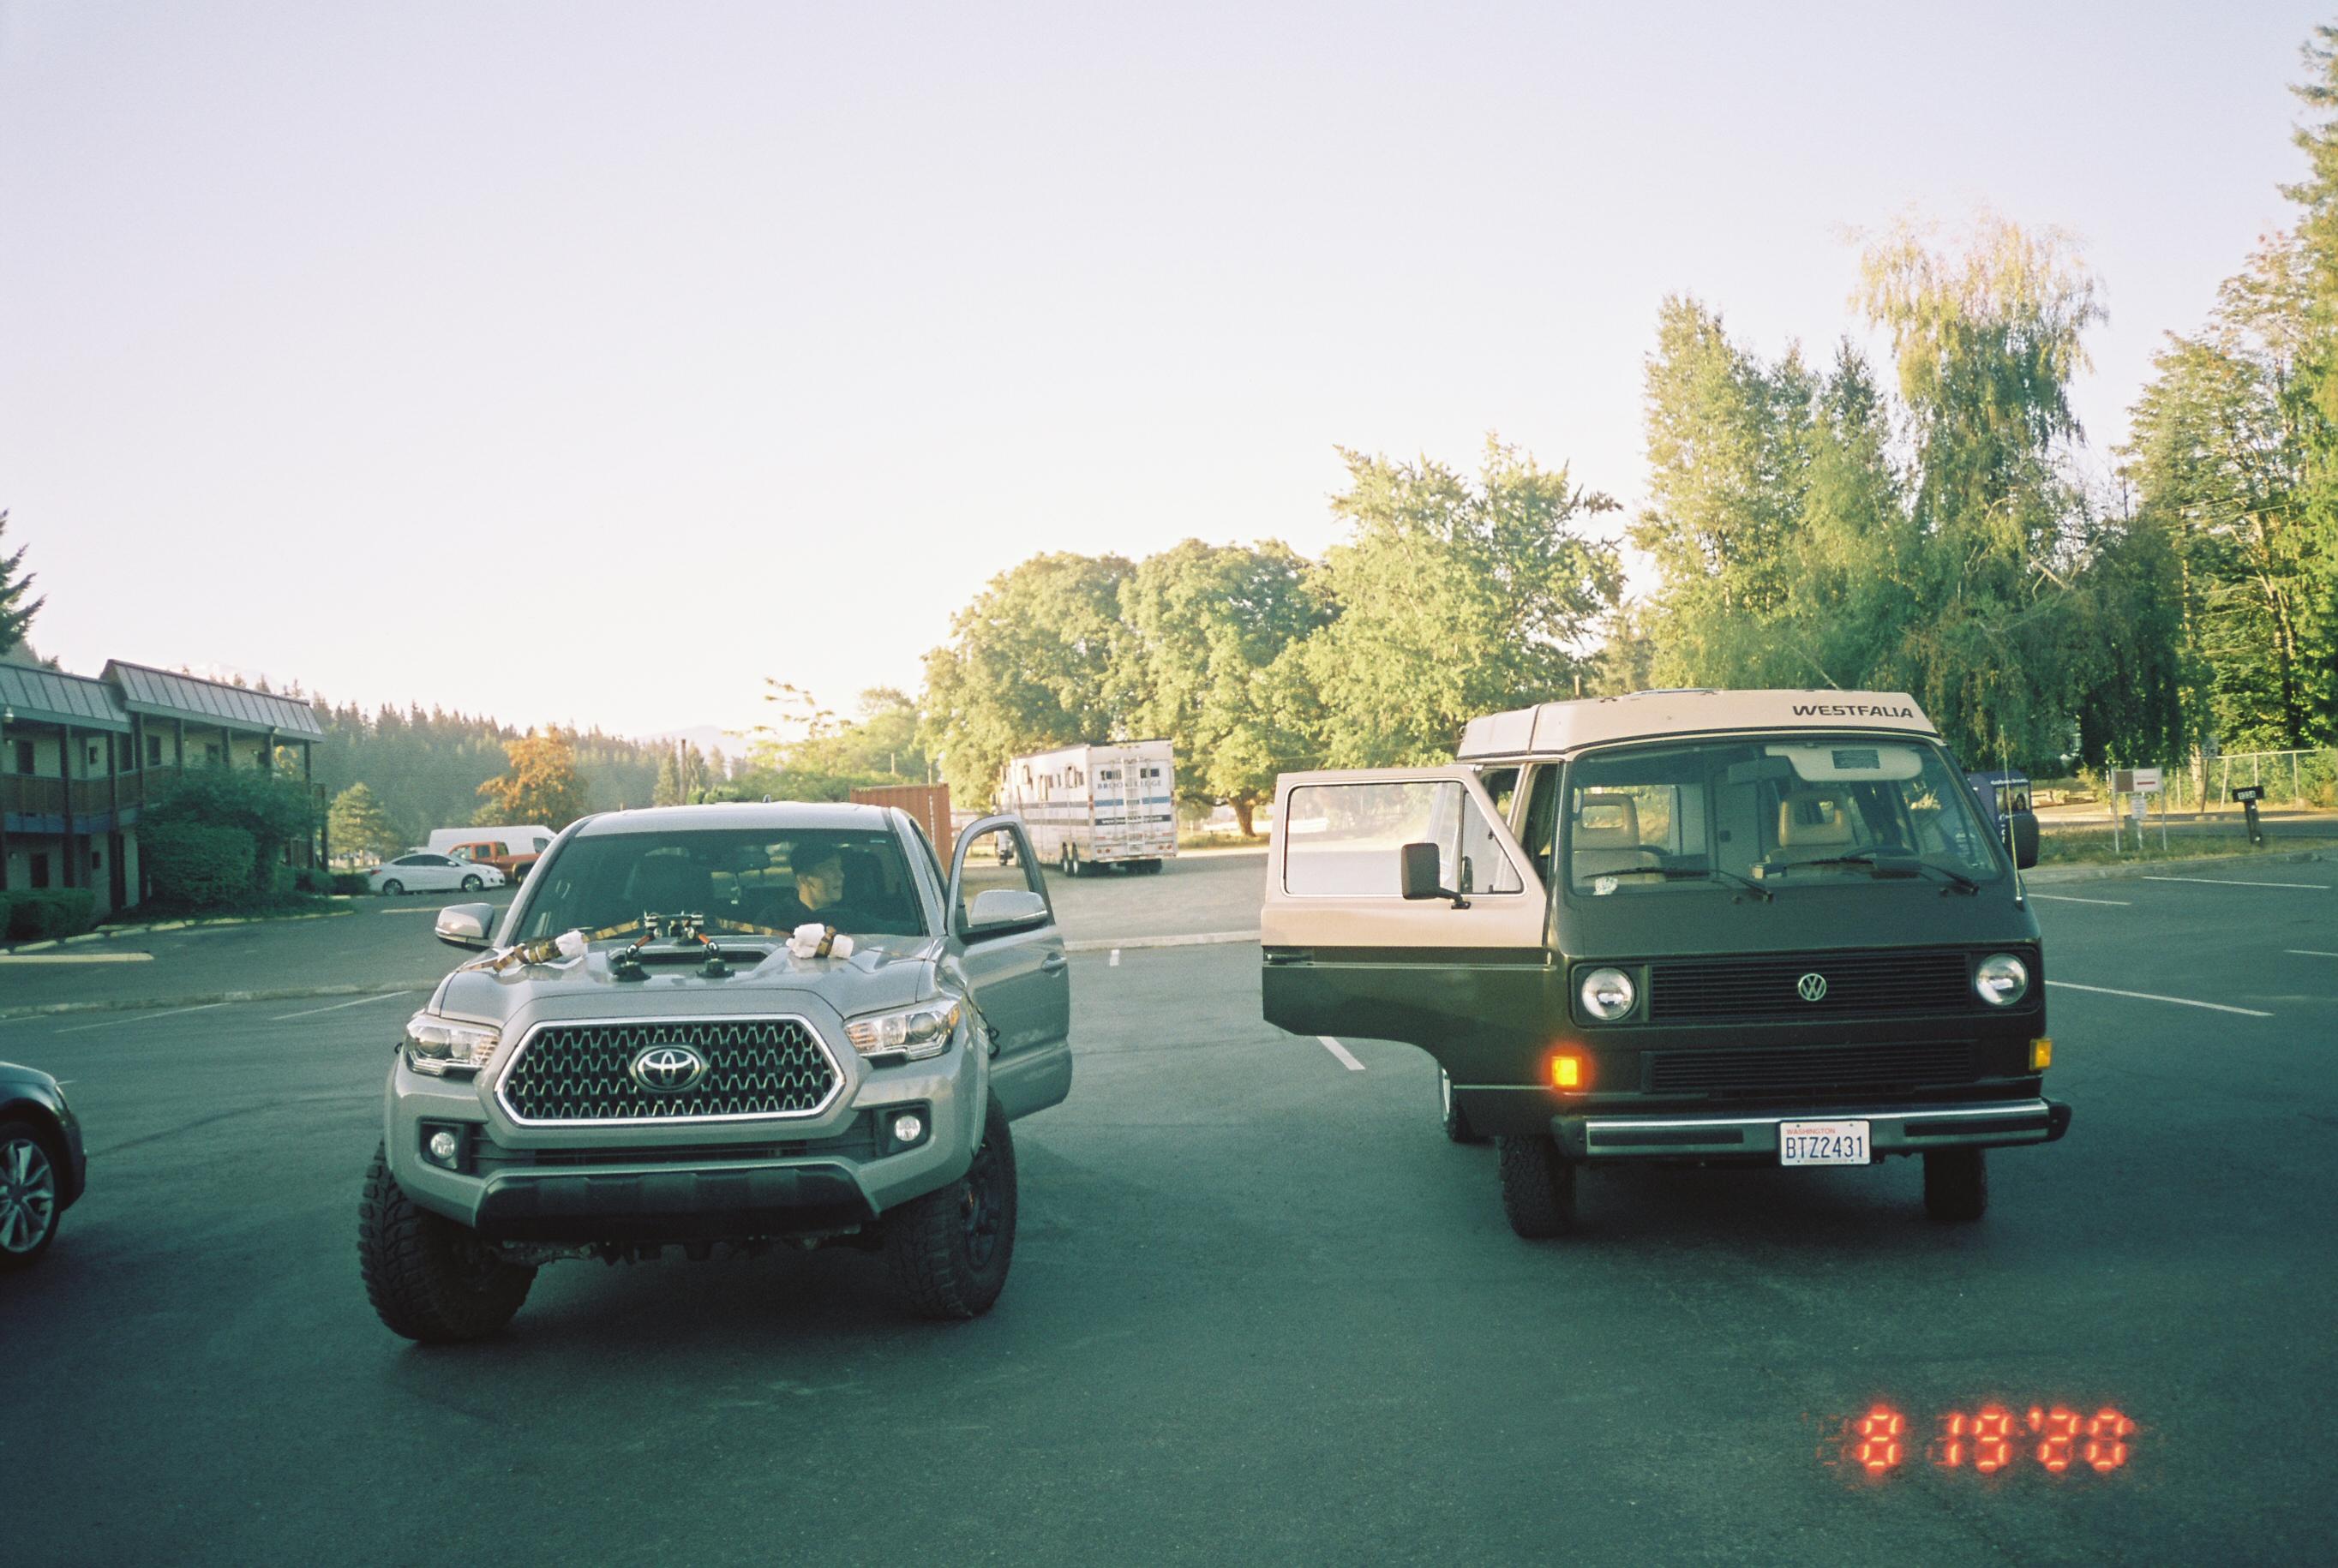 Westfalia & Tacoma